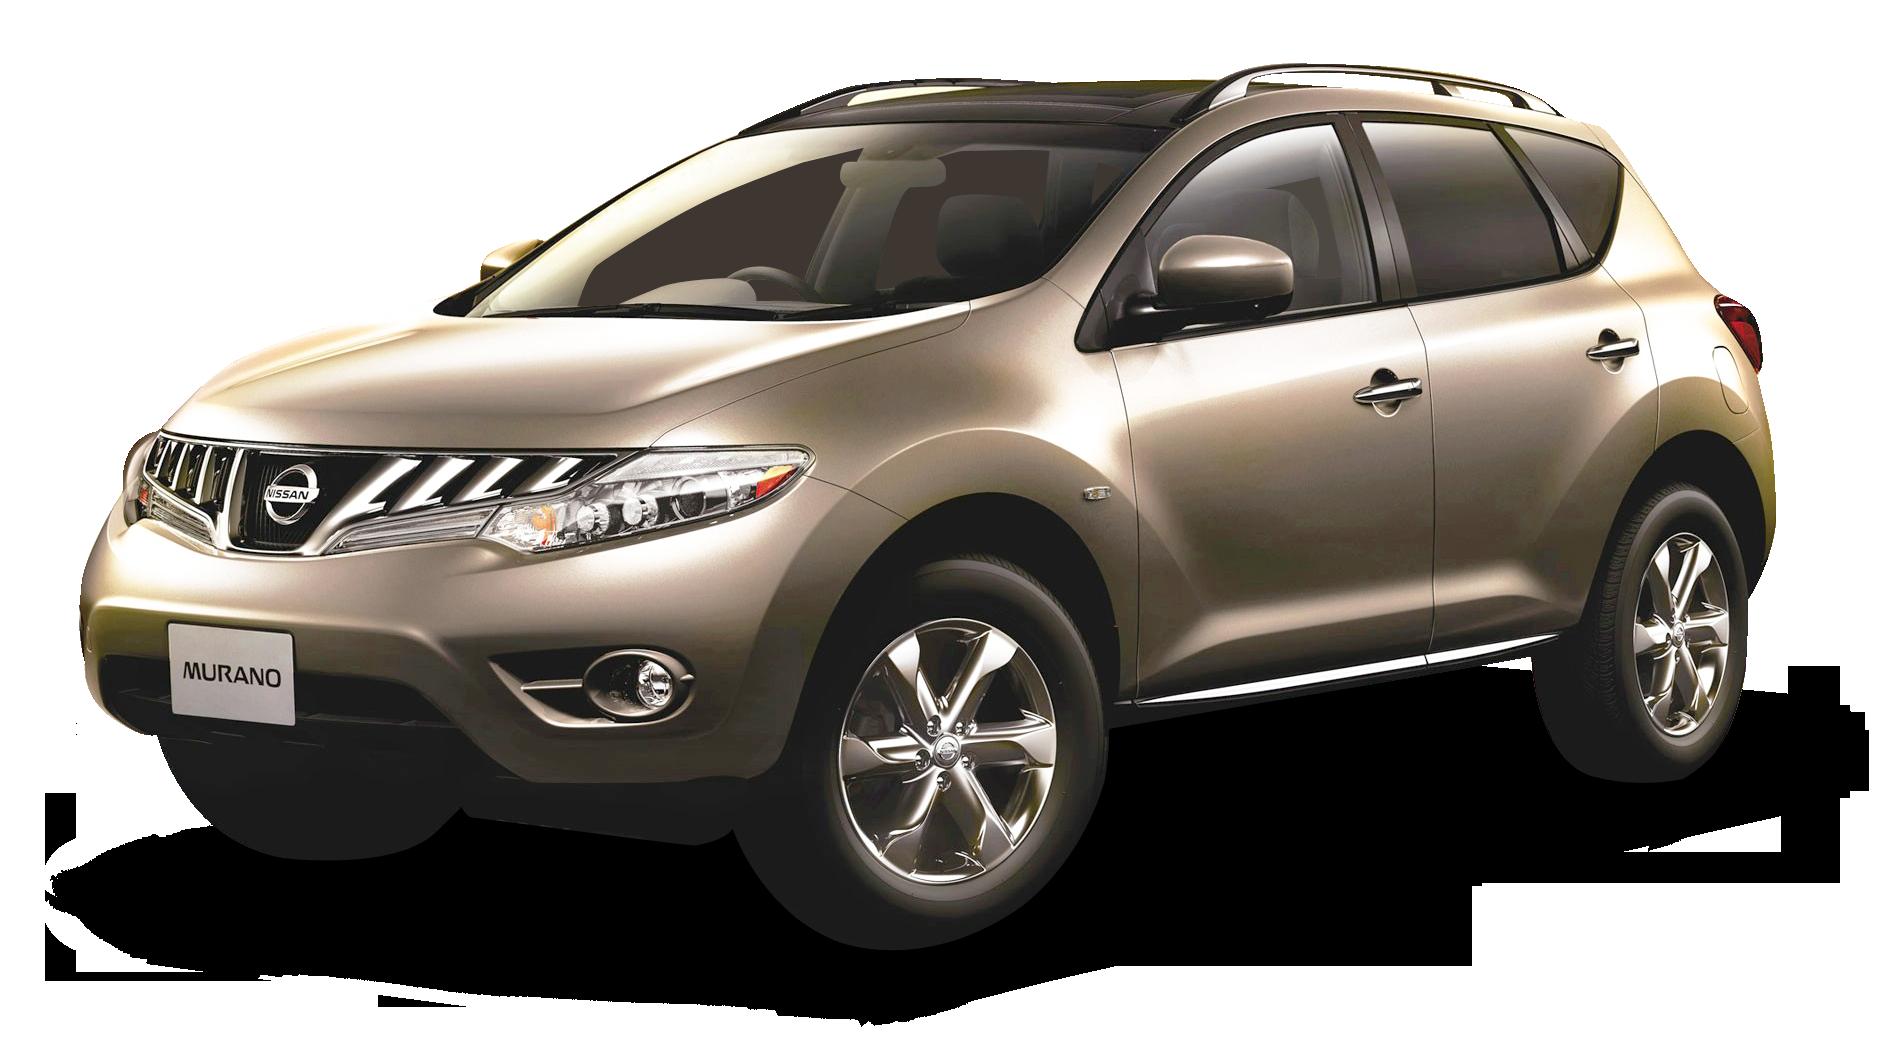 Nissan car PNG images free download.